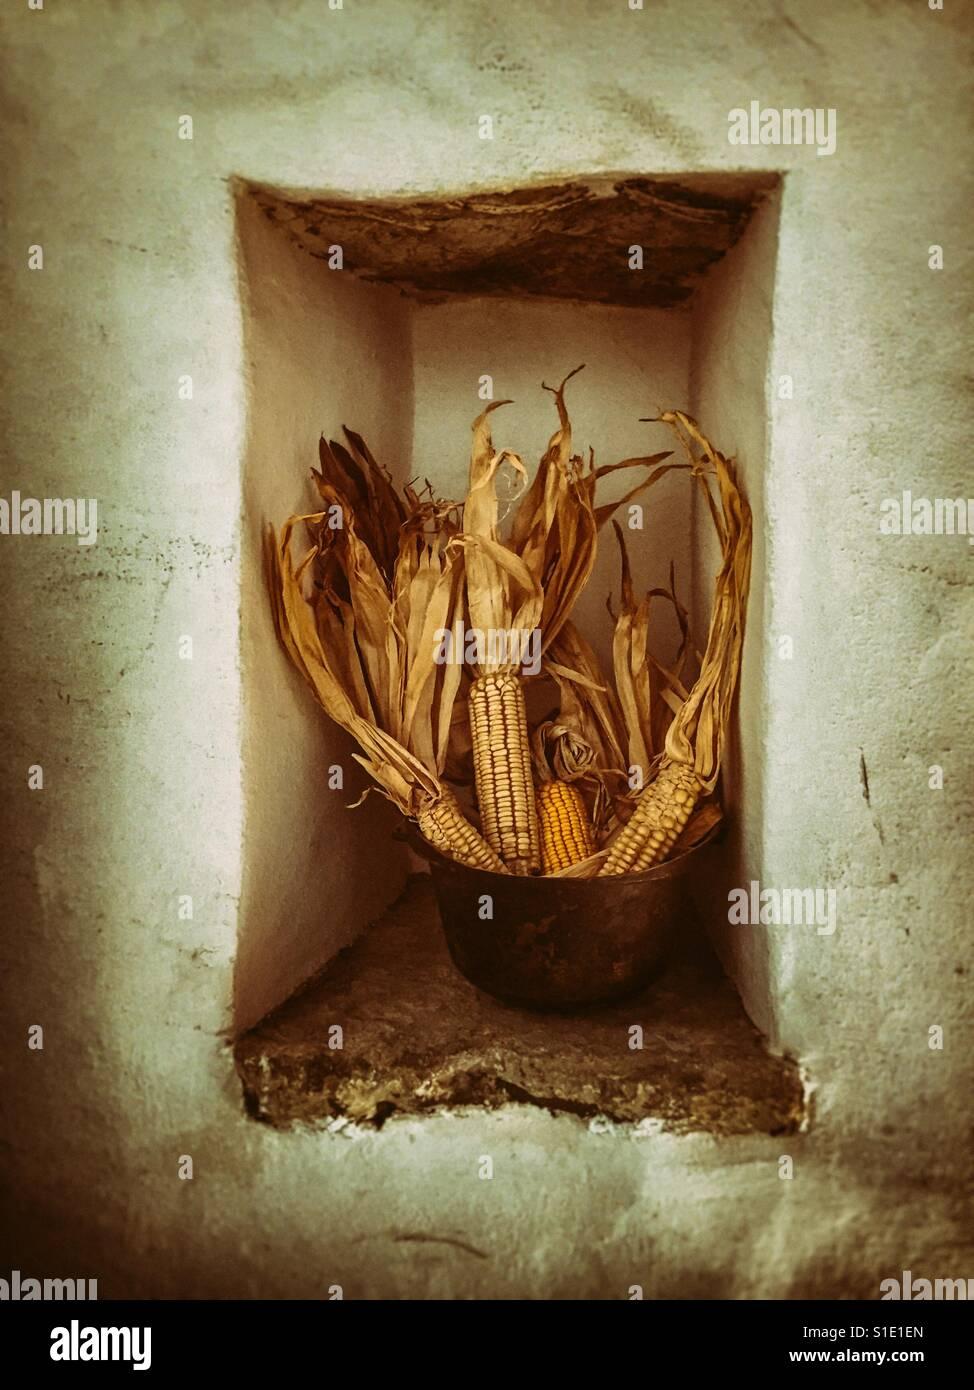 Dried corn arrangement Stock Photo